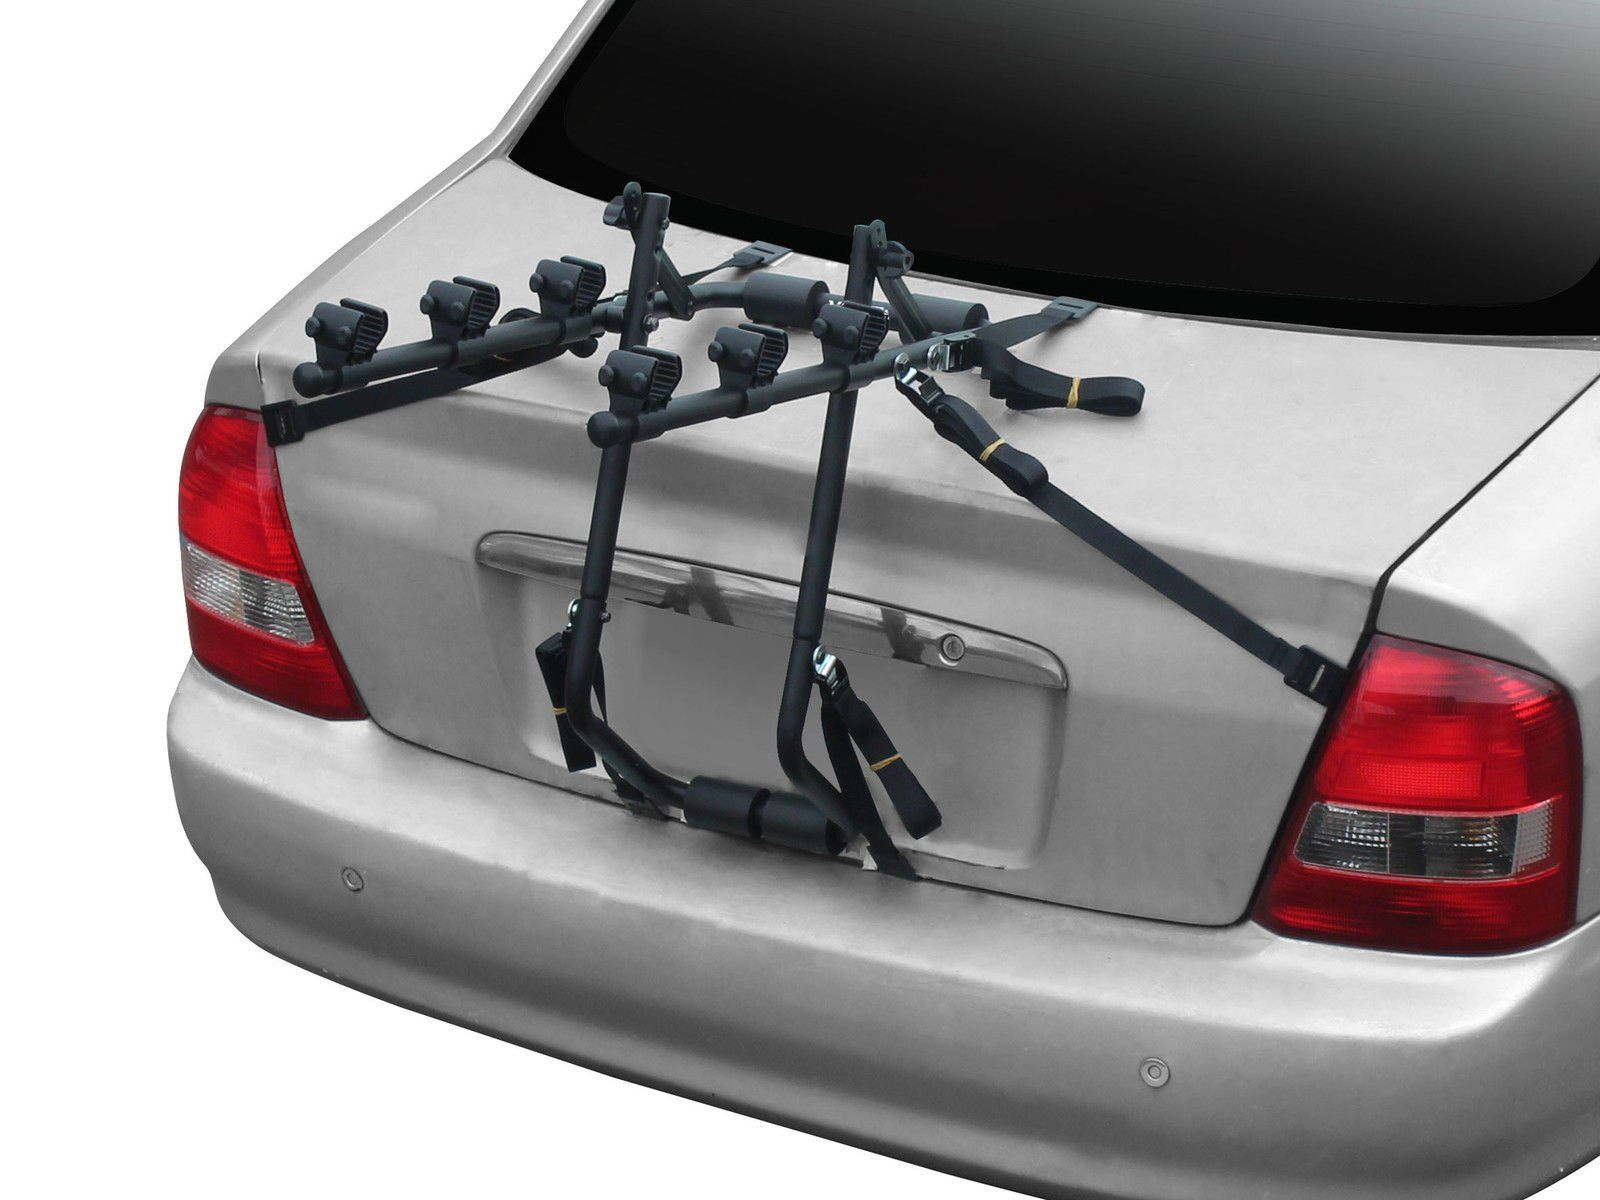 3 Bike Car Carrier Rack Bicycle Rear Racks Strong Lifetime